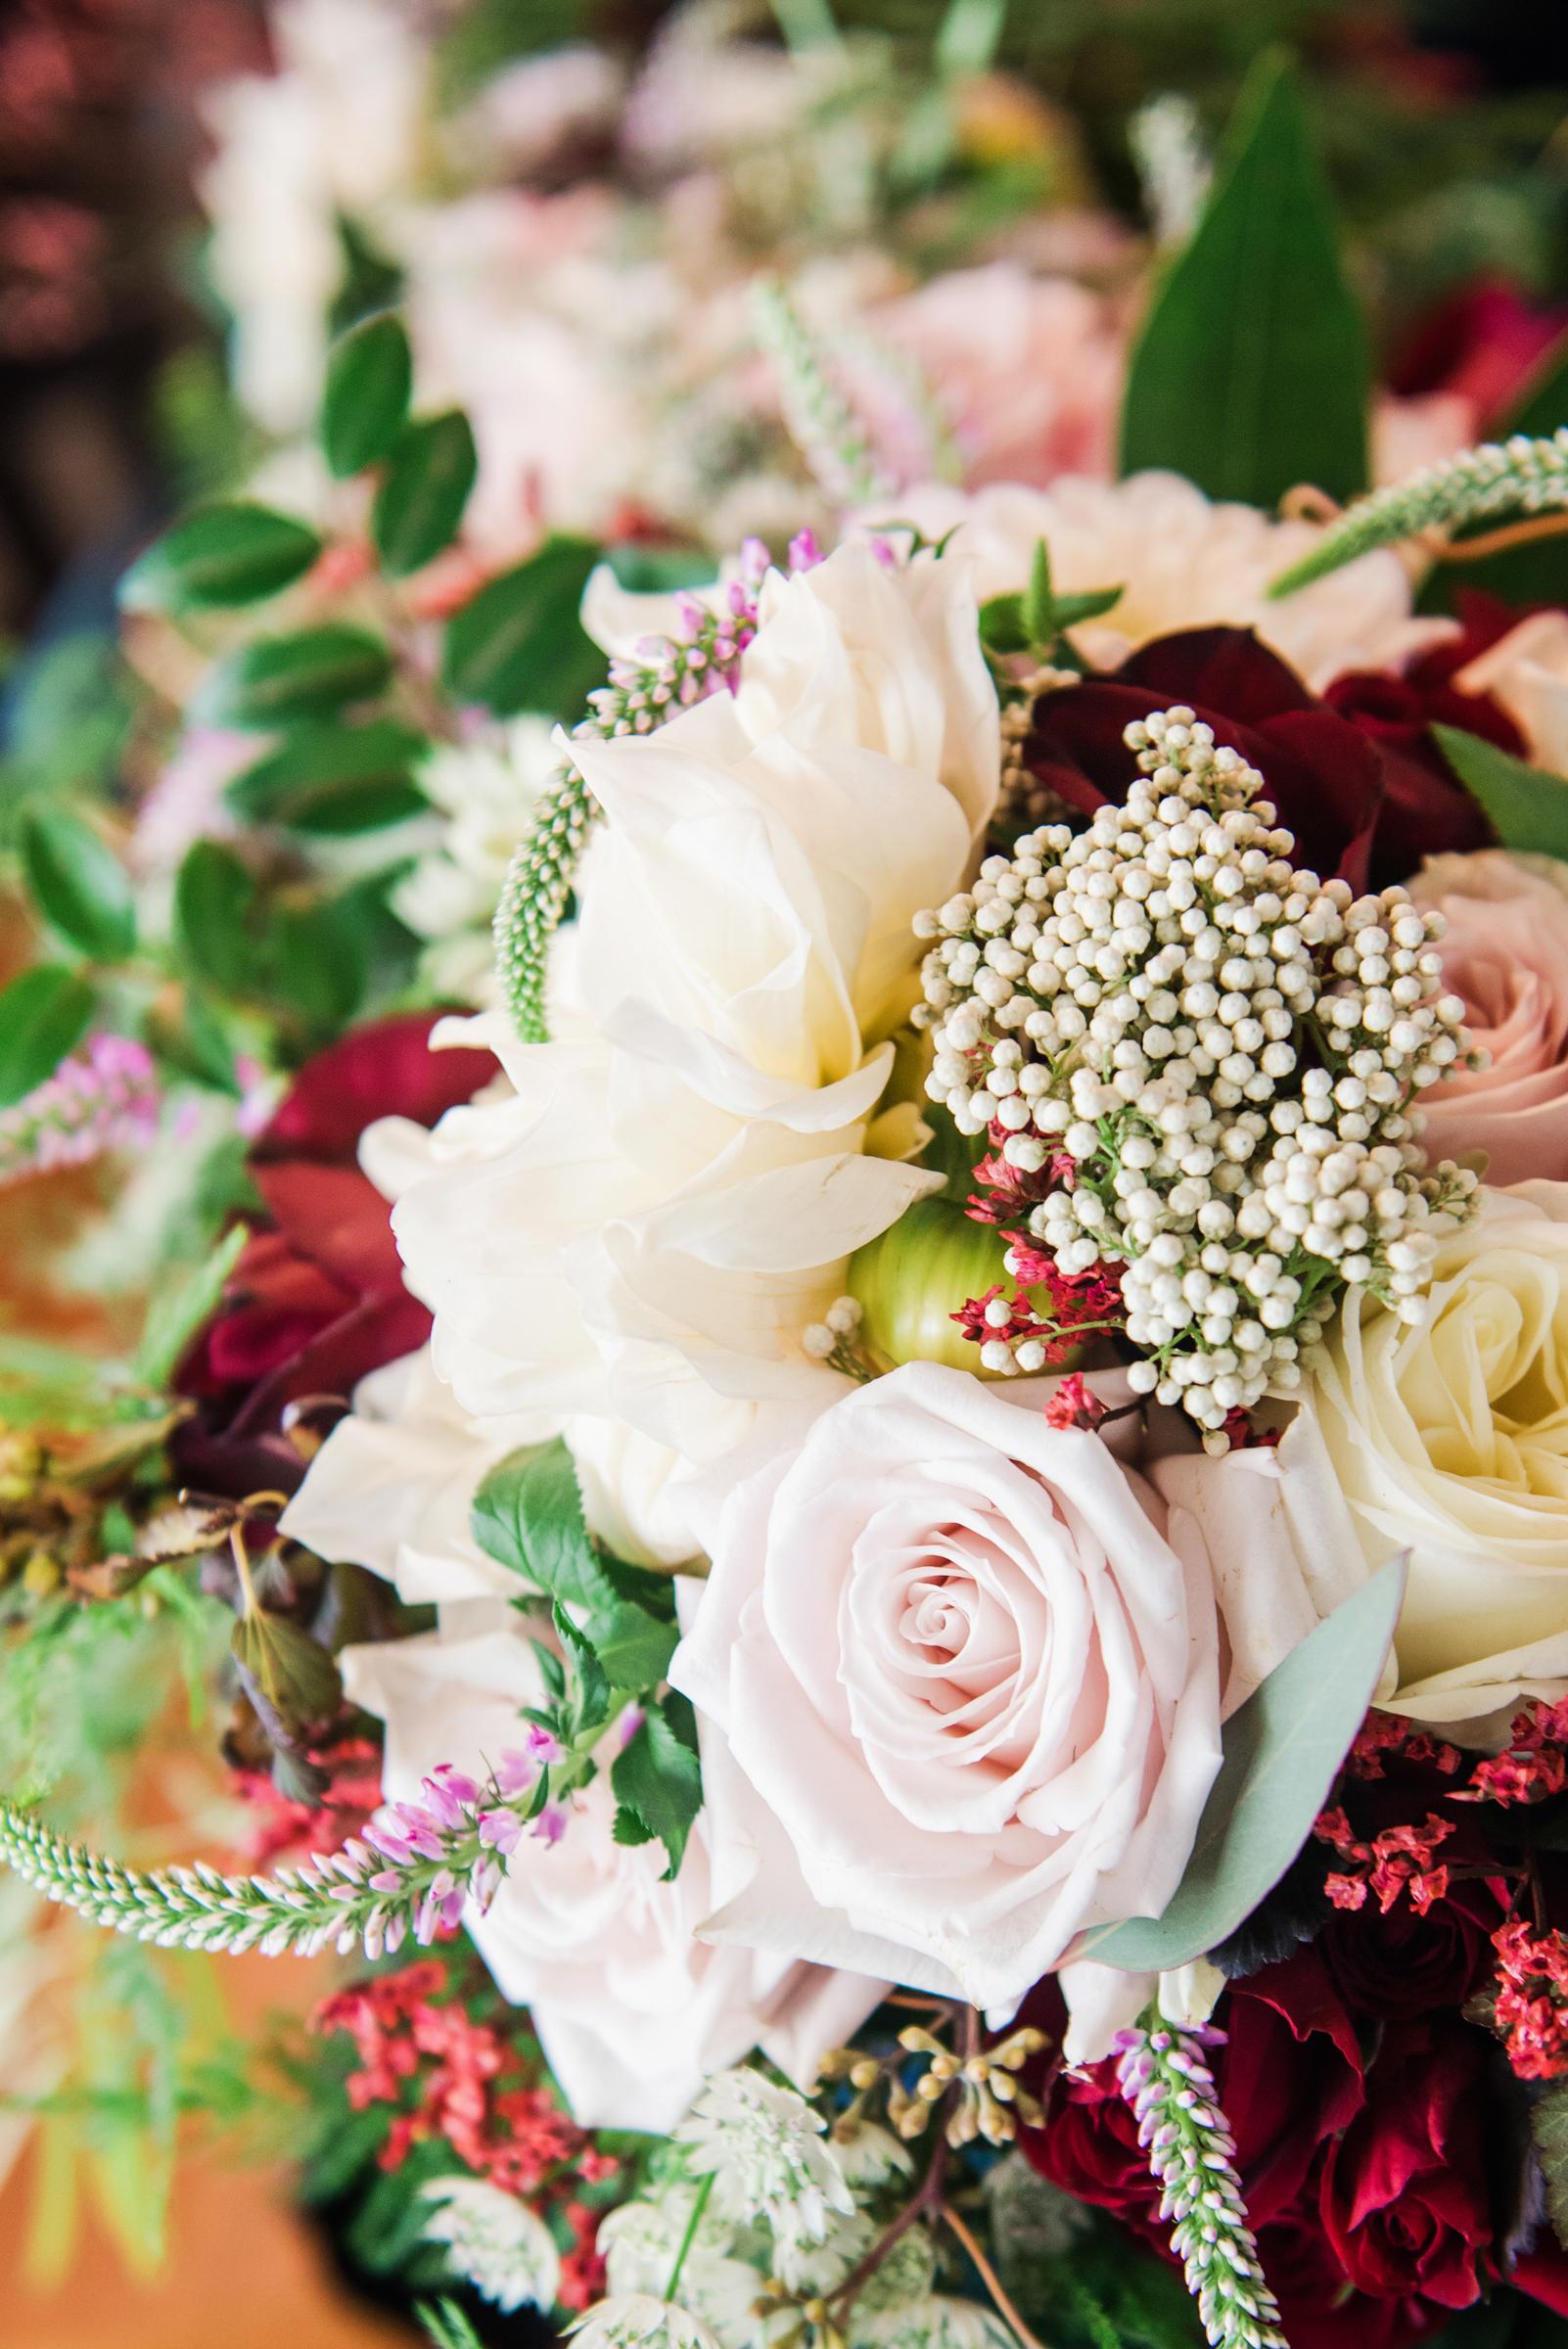 Zugibe_Vineyards_Finger_Lakes_Wedding_JILL_STUDIO_Rochester_NY_Photographer_DSC_3249.jpg